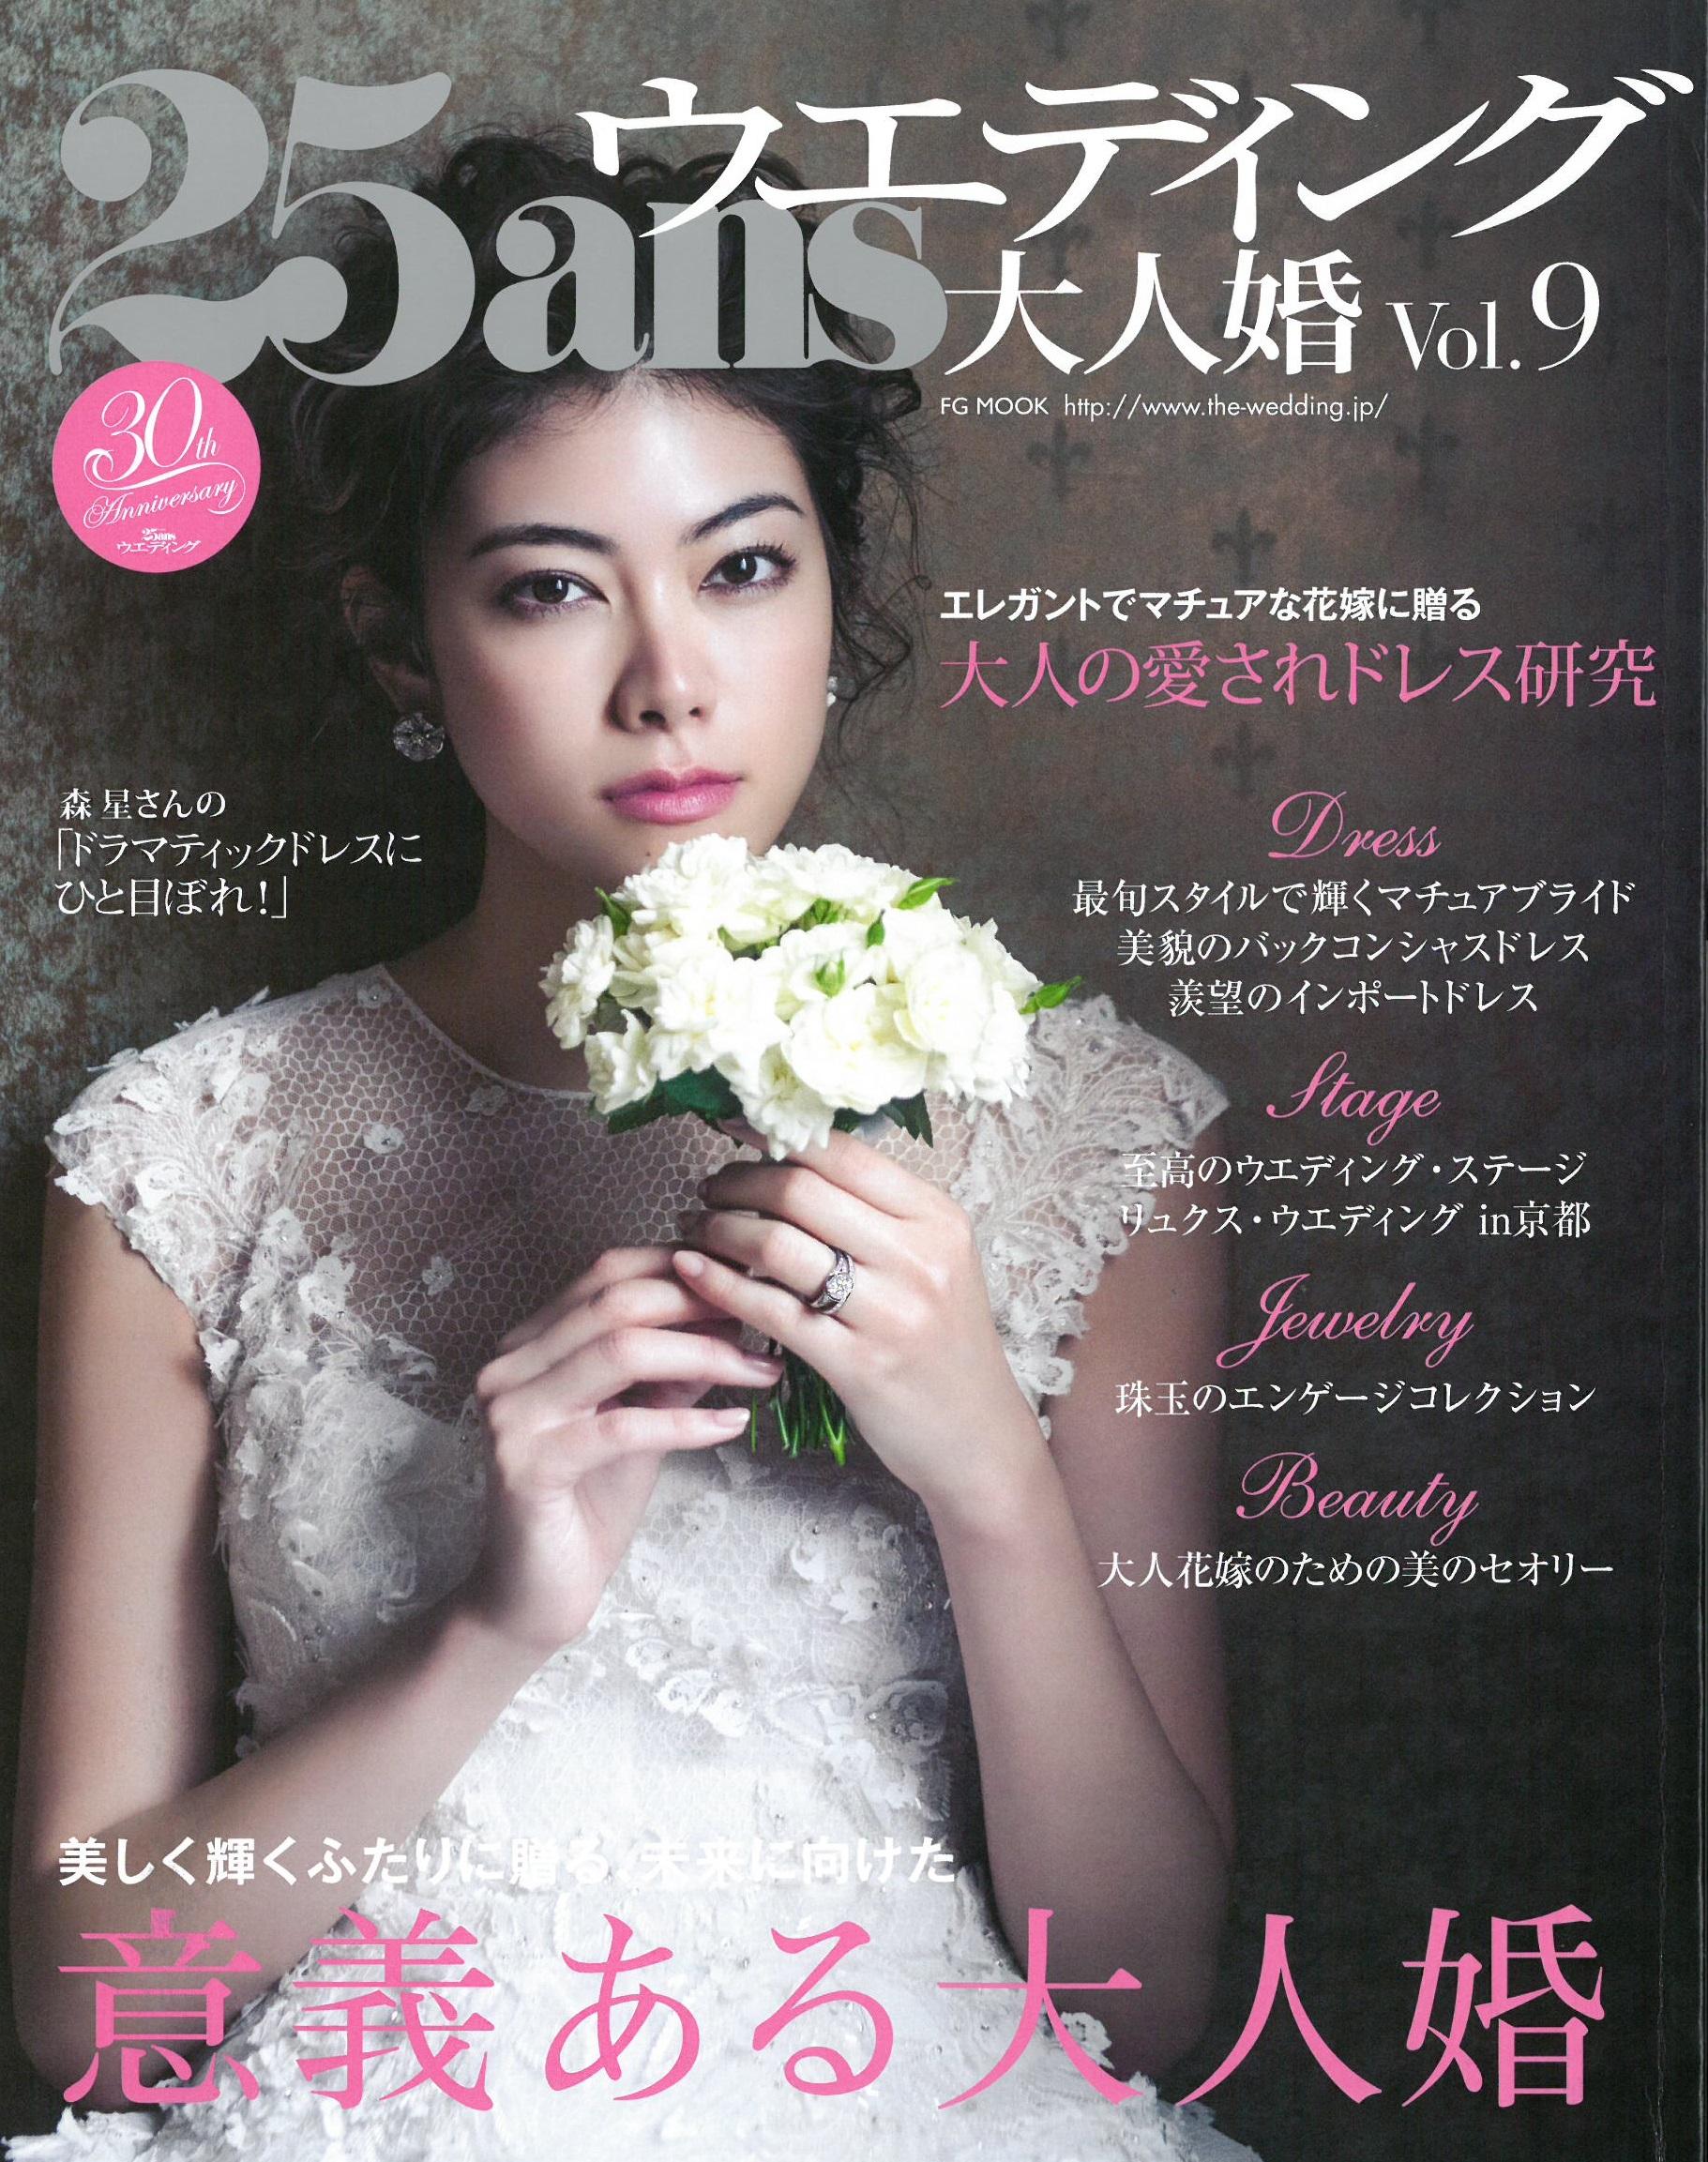 25ansウエディング 大人婚vol.9表紙